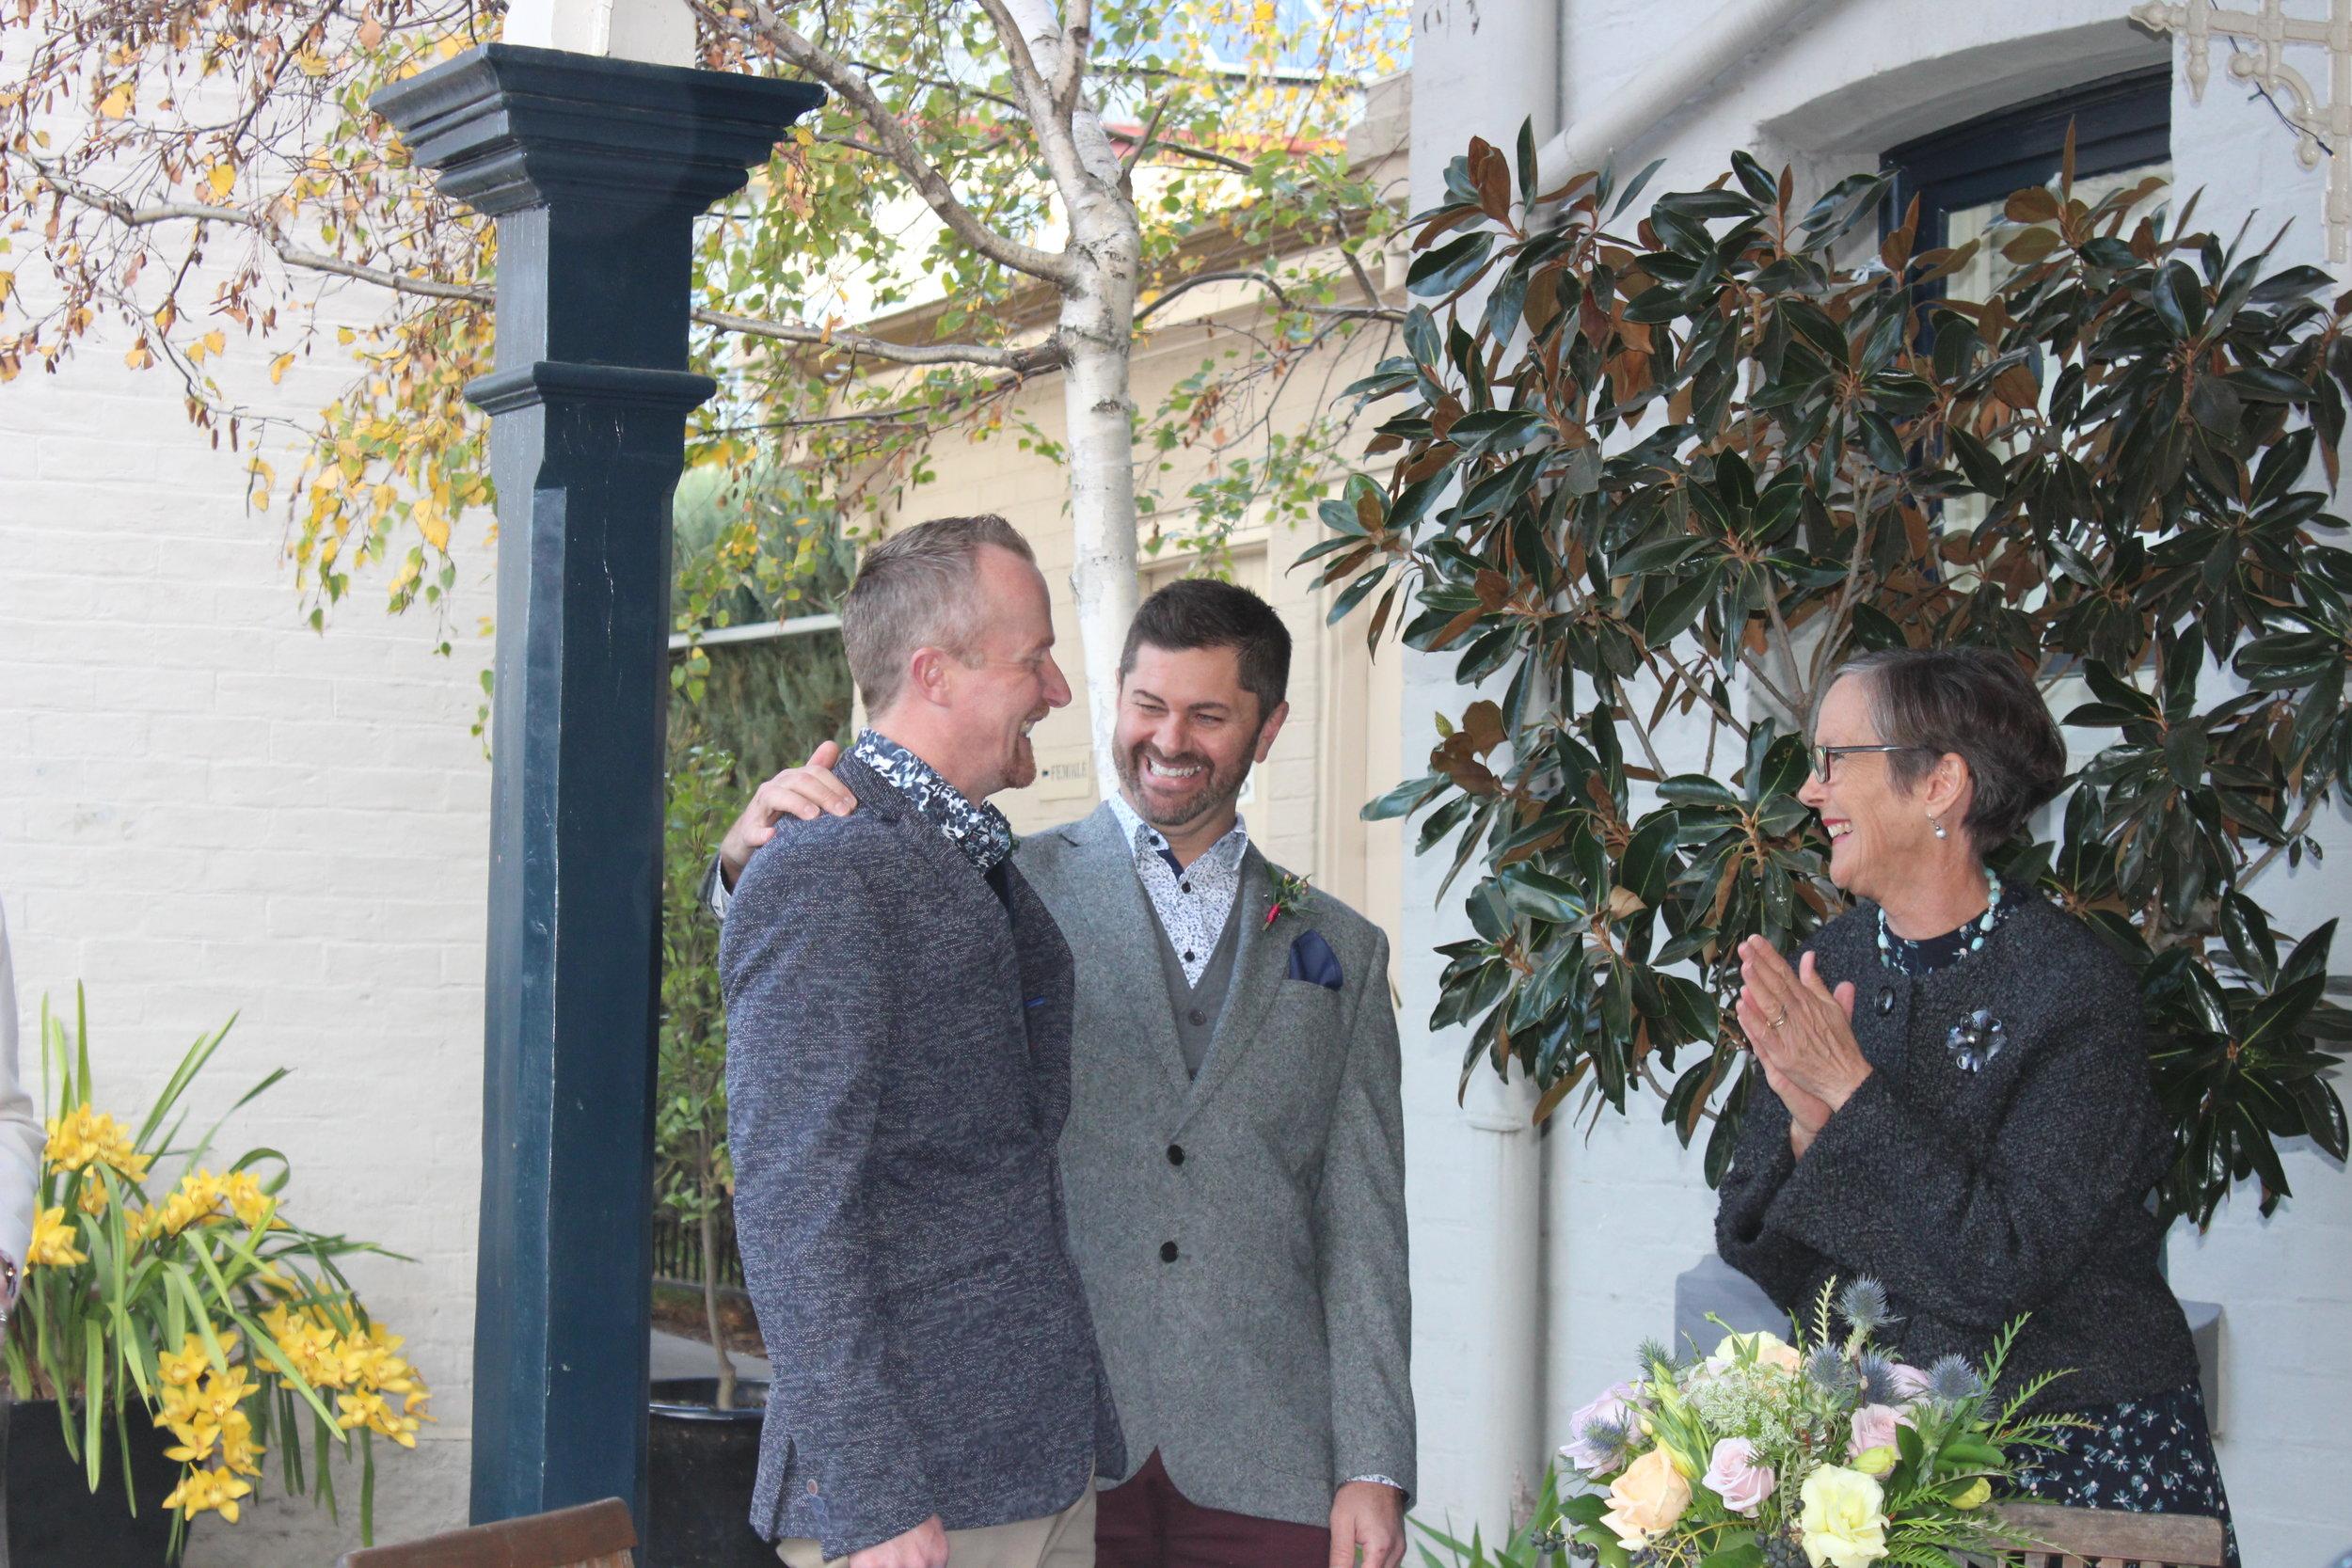 Image: Sarah Darby, Bendigo Wine Bank wedding